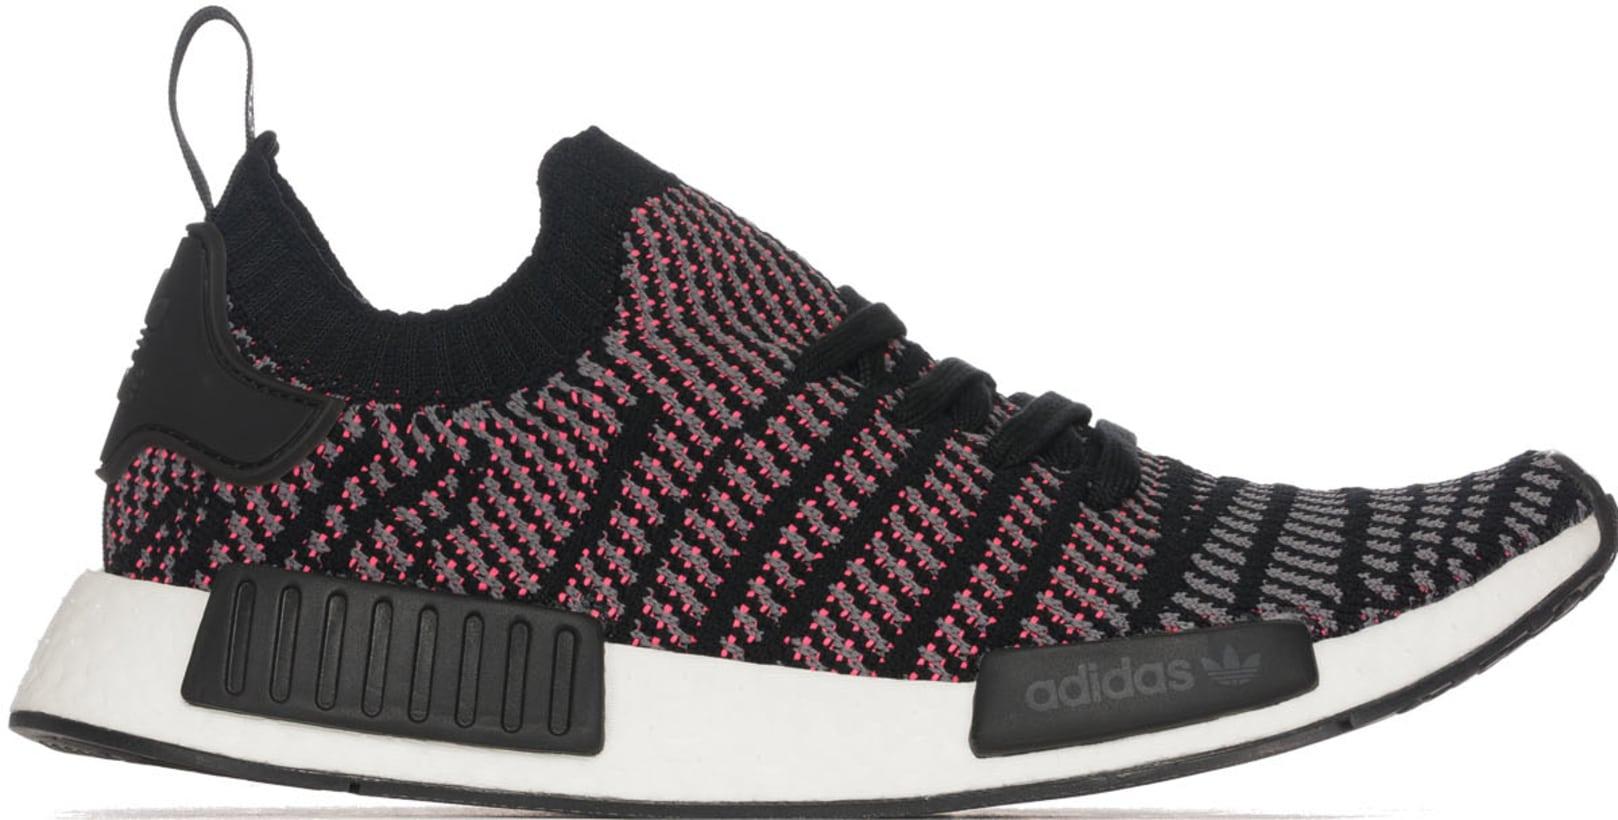 adidas Originals  NMD R1 STLT Primeknit - Core Black Grey Solar Pink ... f0d70dcb9